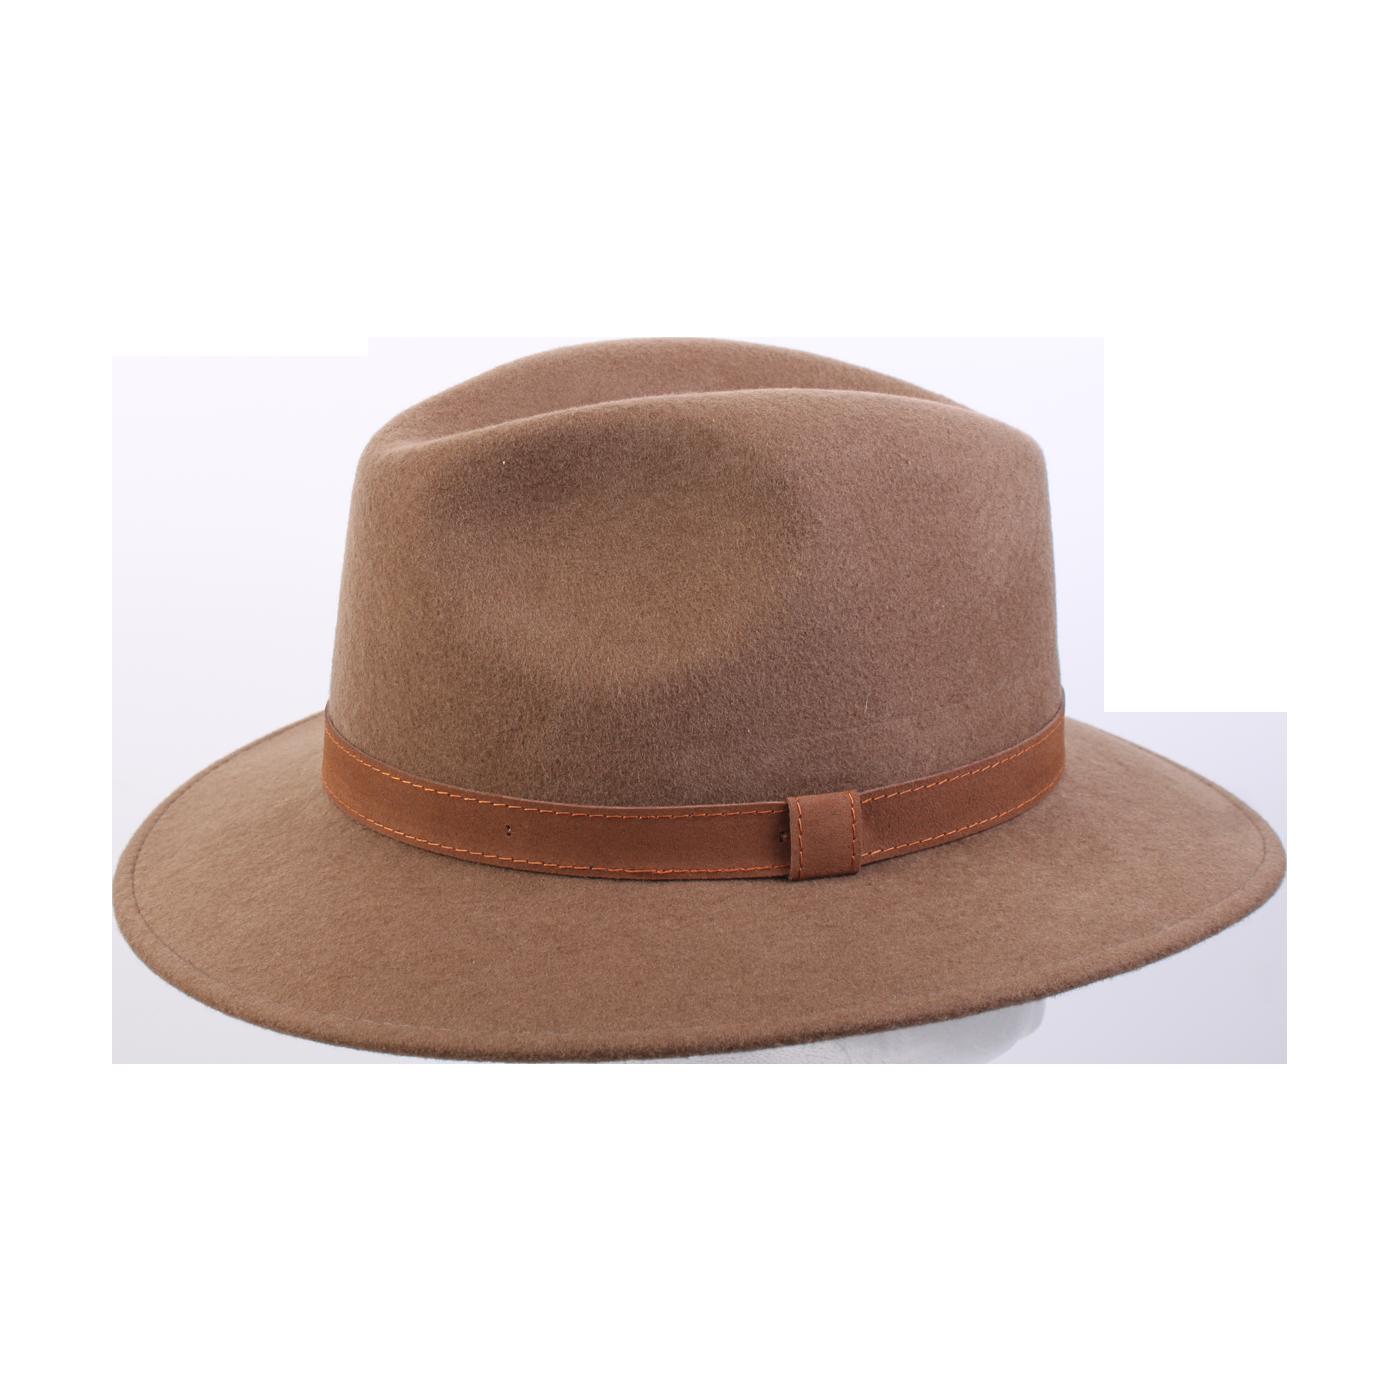 Wigéns Bosco Hat Camel